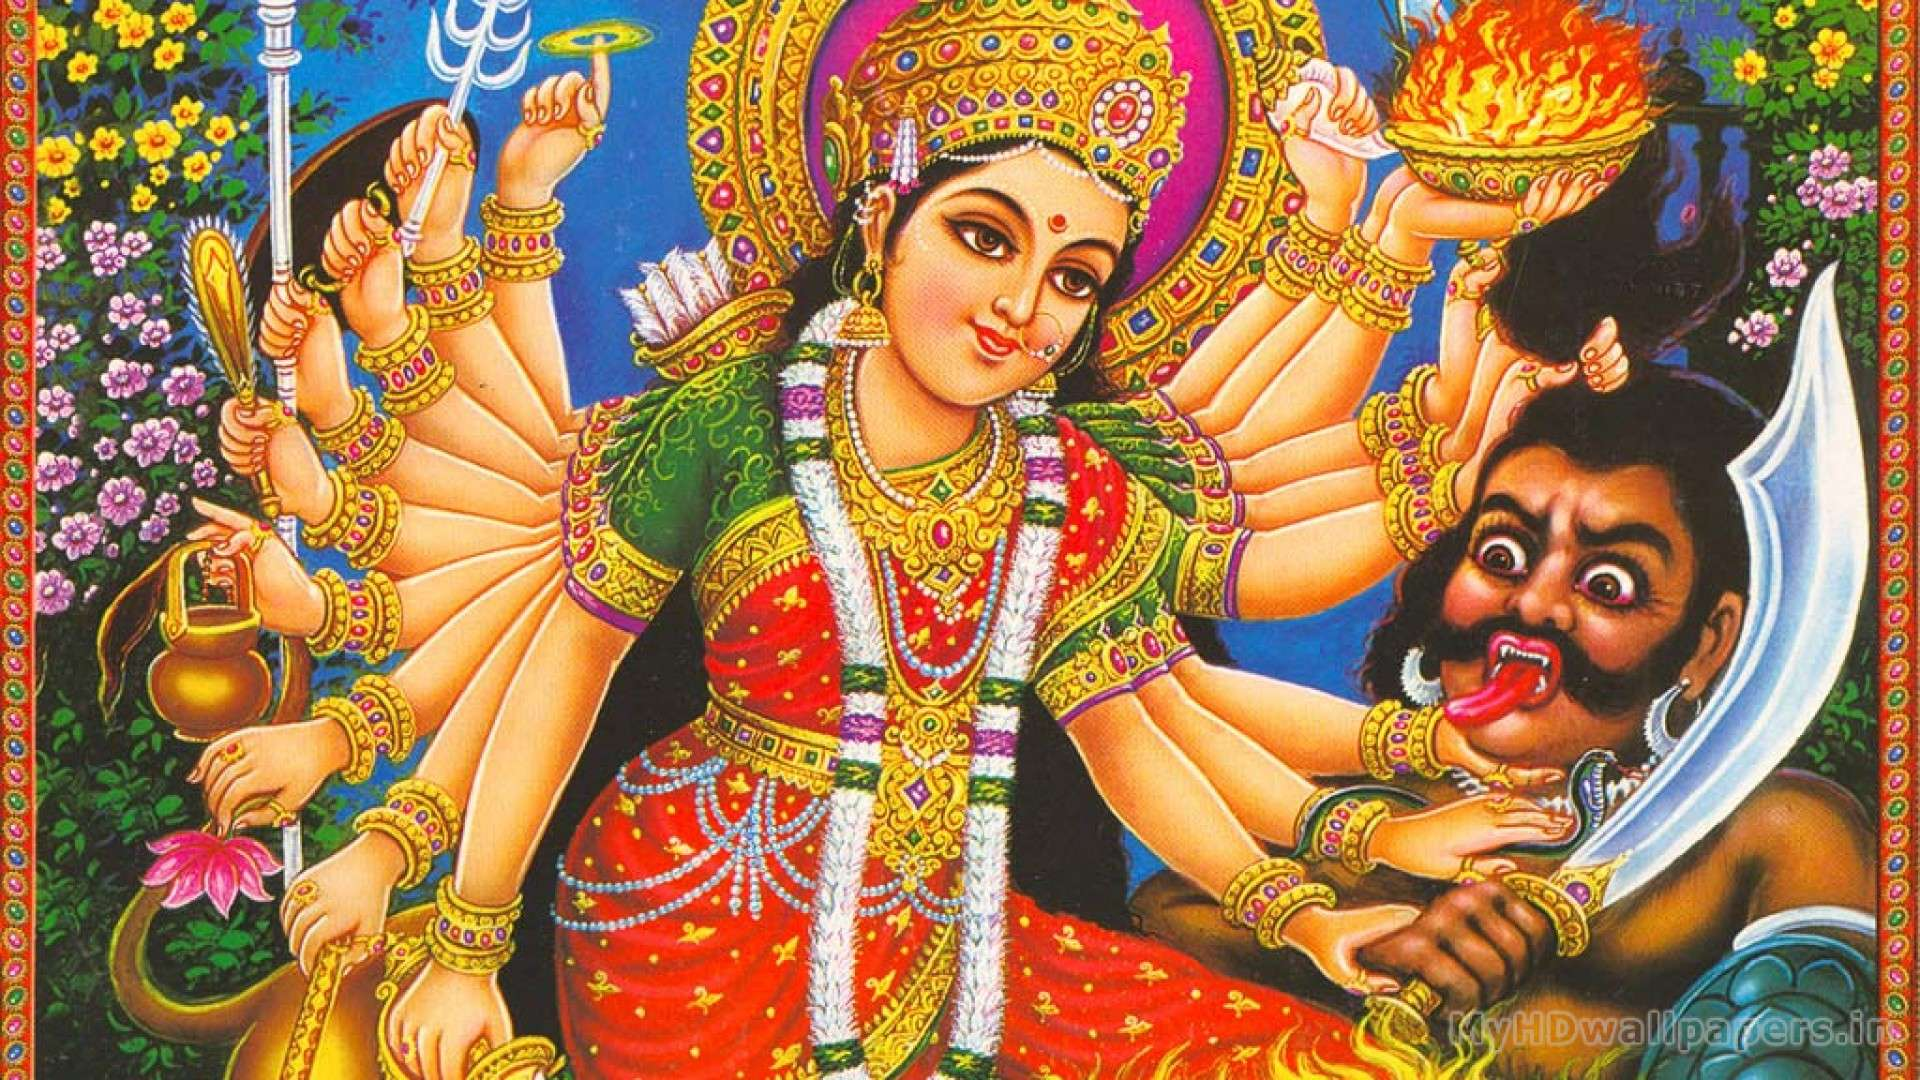 Maa Durga Hd Wallpaper Desktop Hd Wallpapers 3d Durga Maa Wallpaper Full Size 1920x1080 Download Hd Wallpaper Wallpapertip